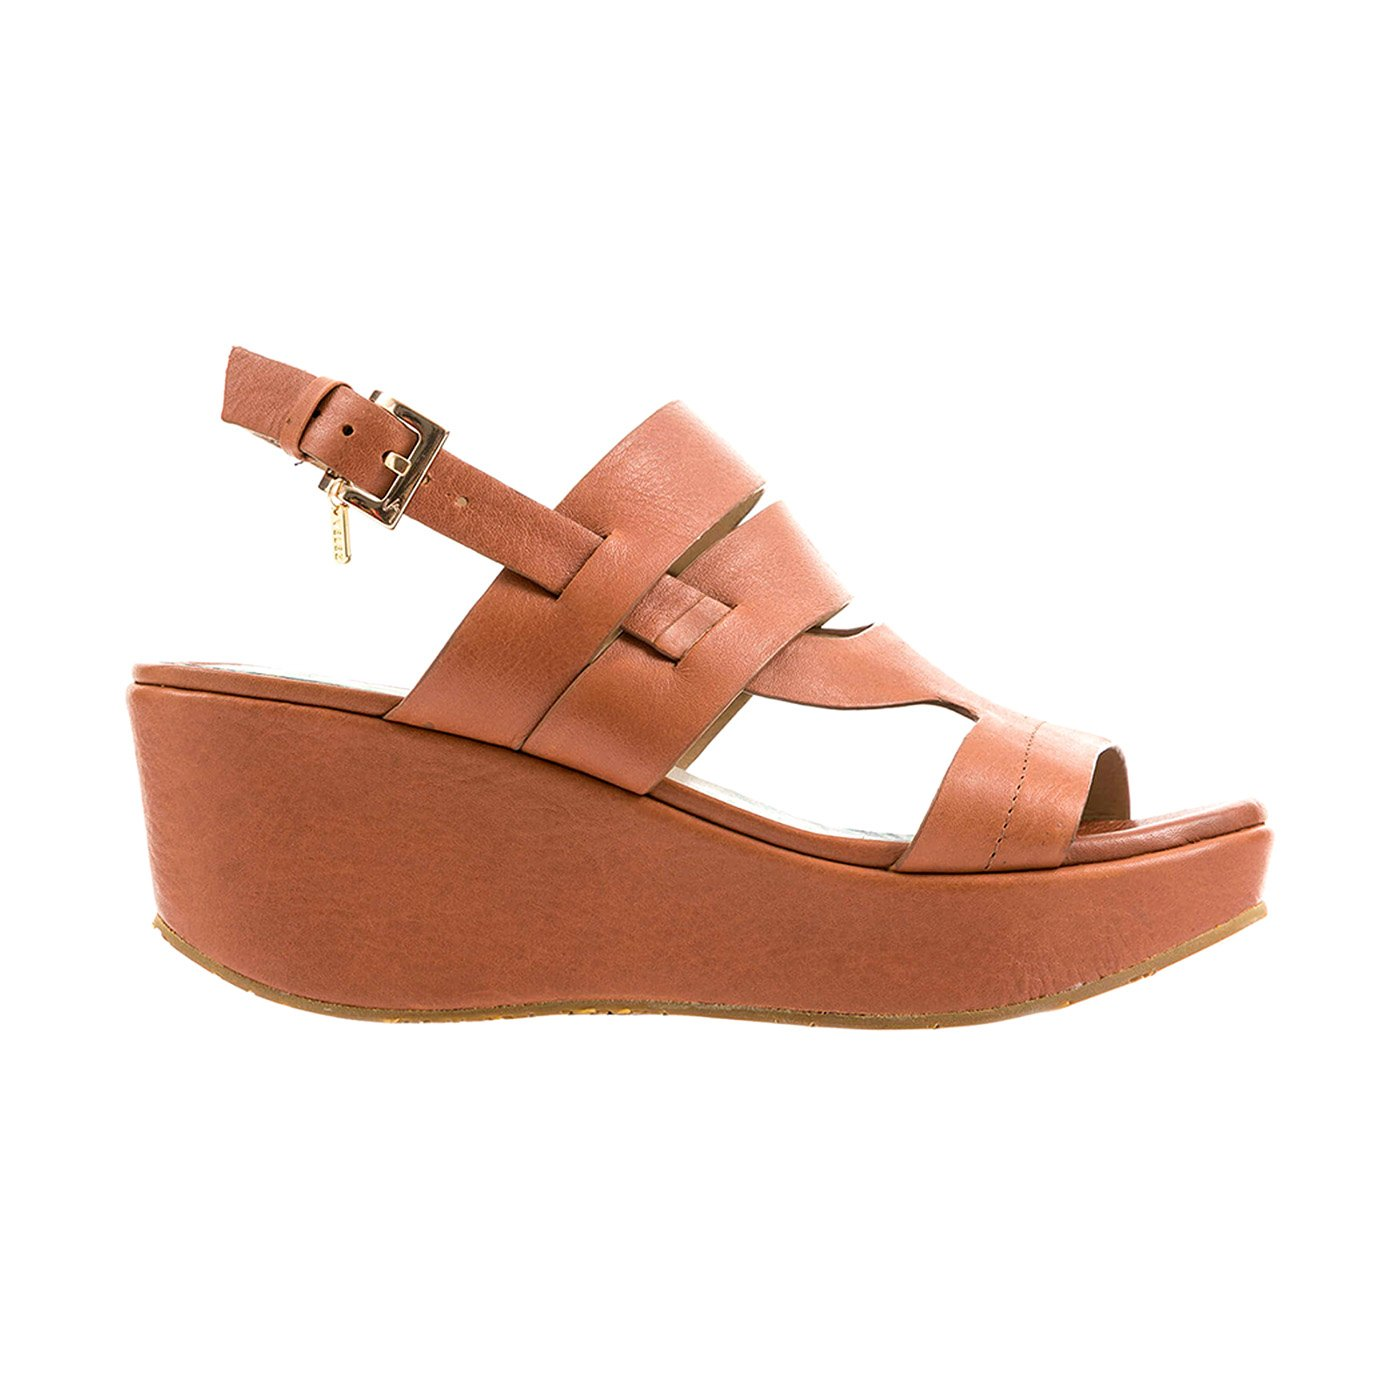 Amazon.com: VELEZ Women Genuine Colombian Leather Platform Sandals | Sandalias de Cuero con Plataforma para Mujer: Clothing